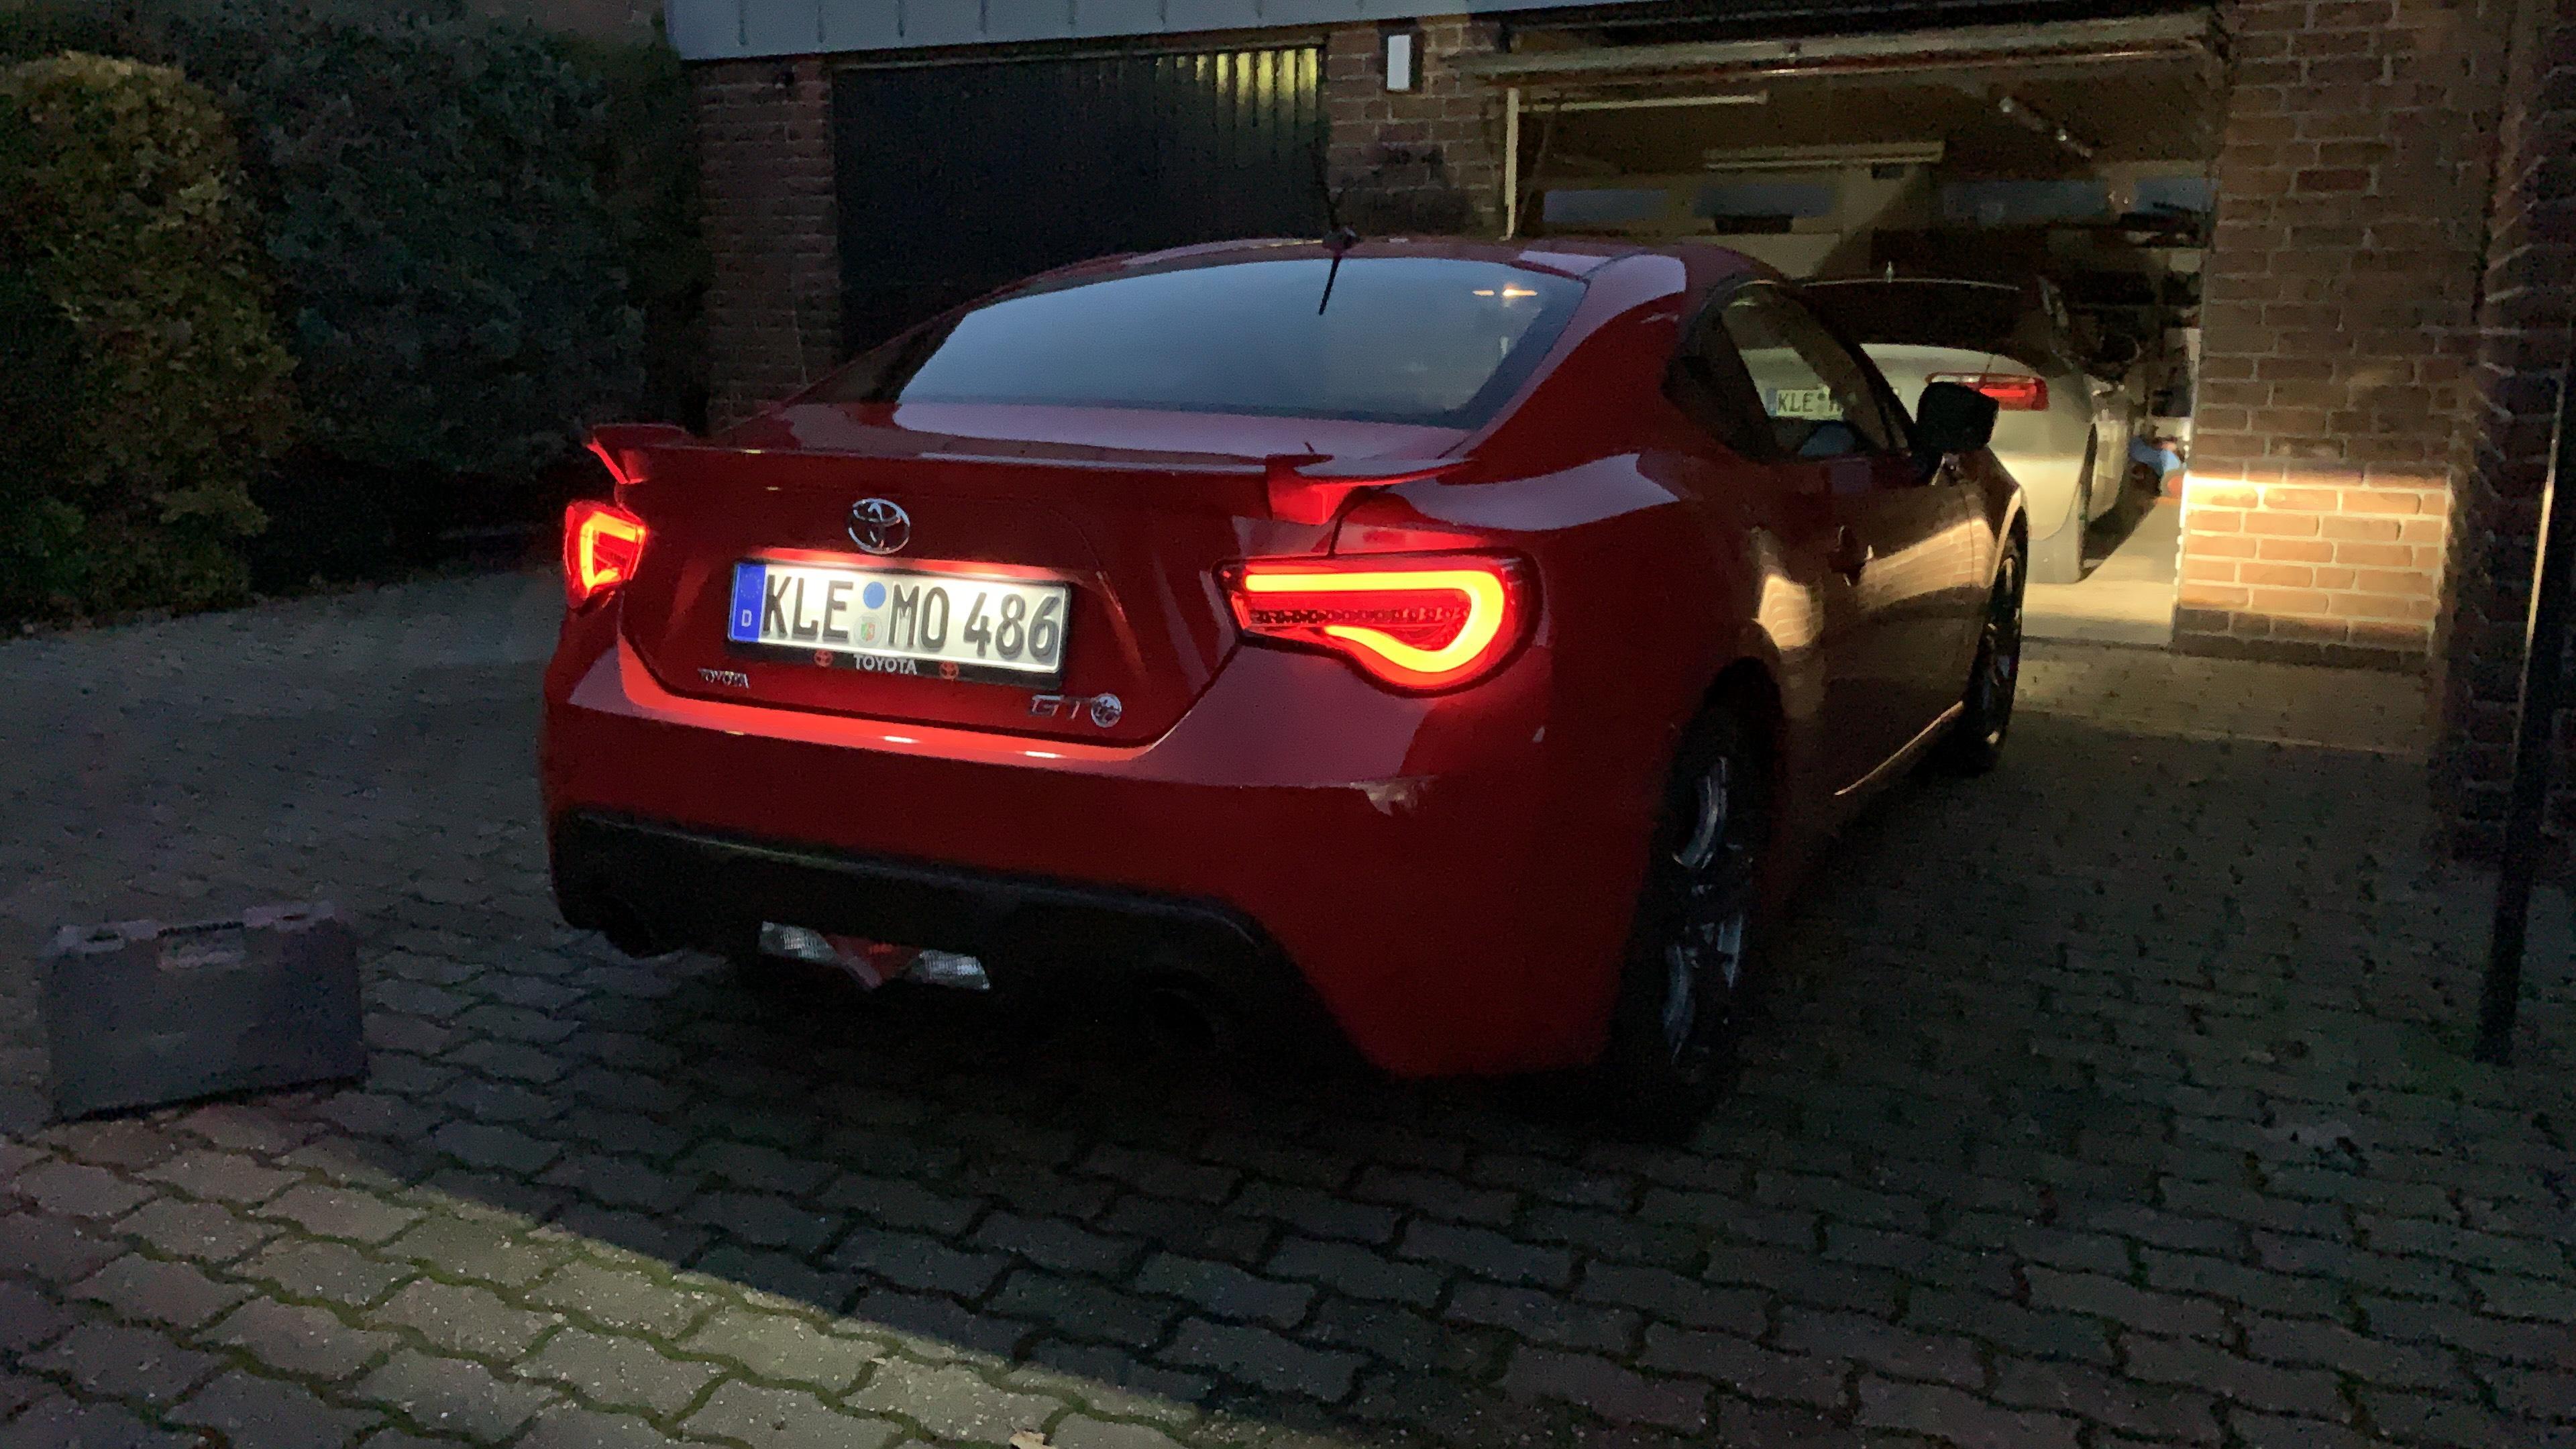 Finally Valenti Tail Lights